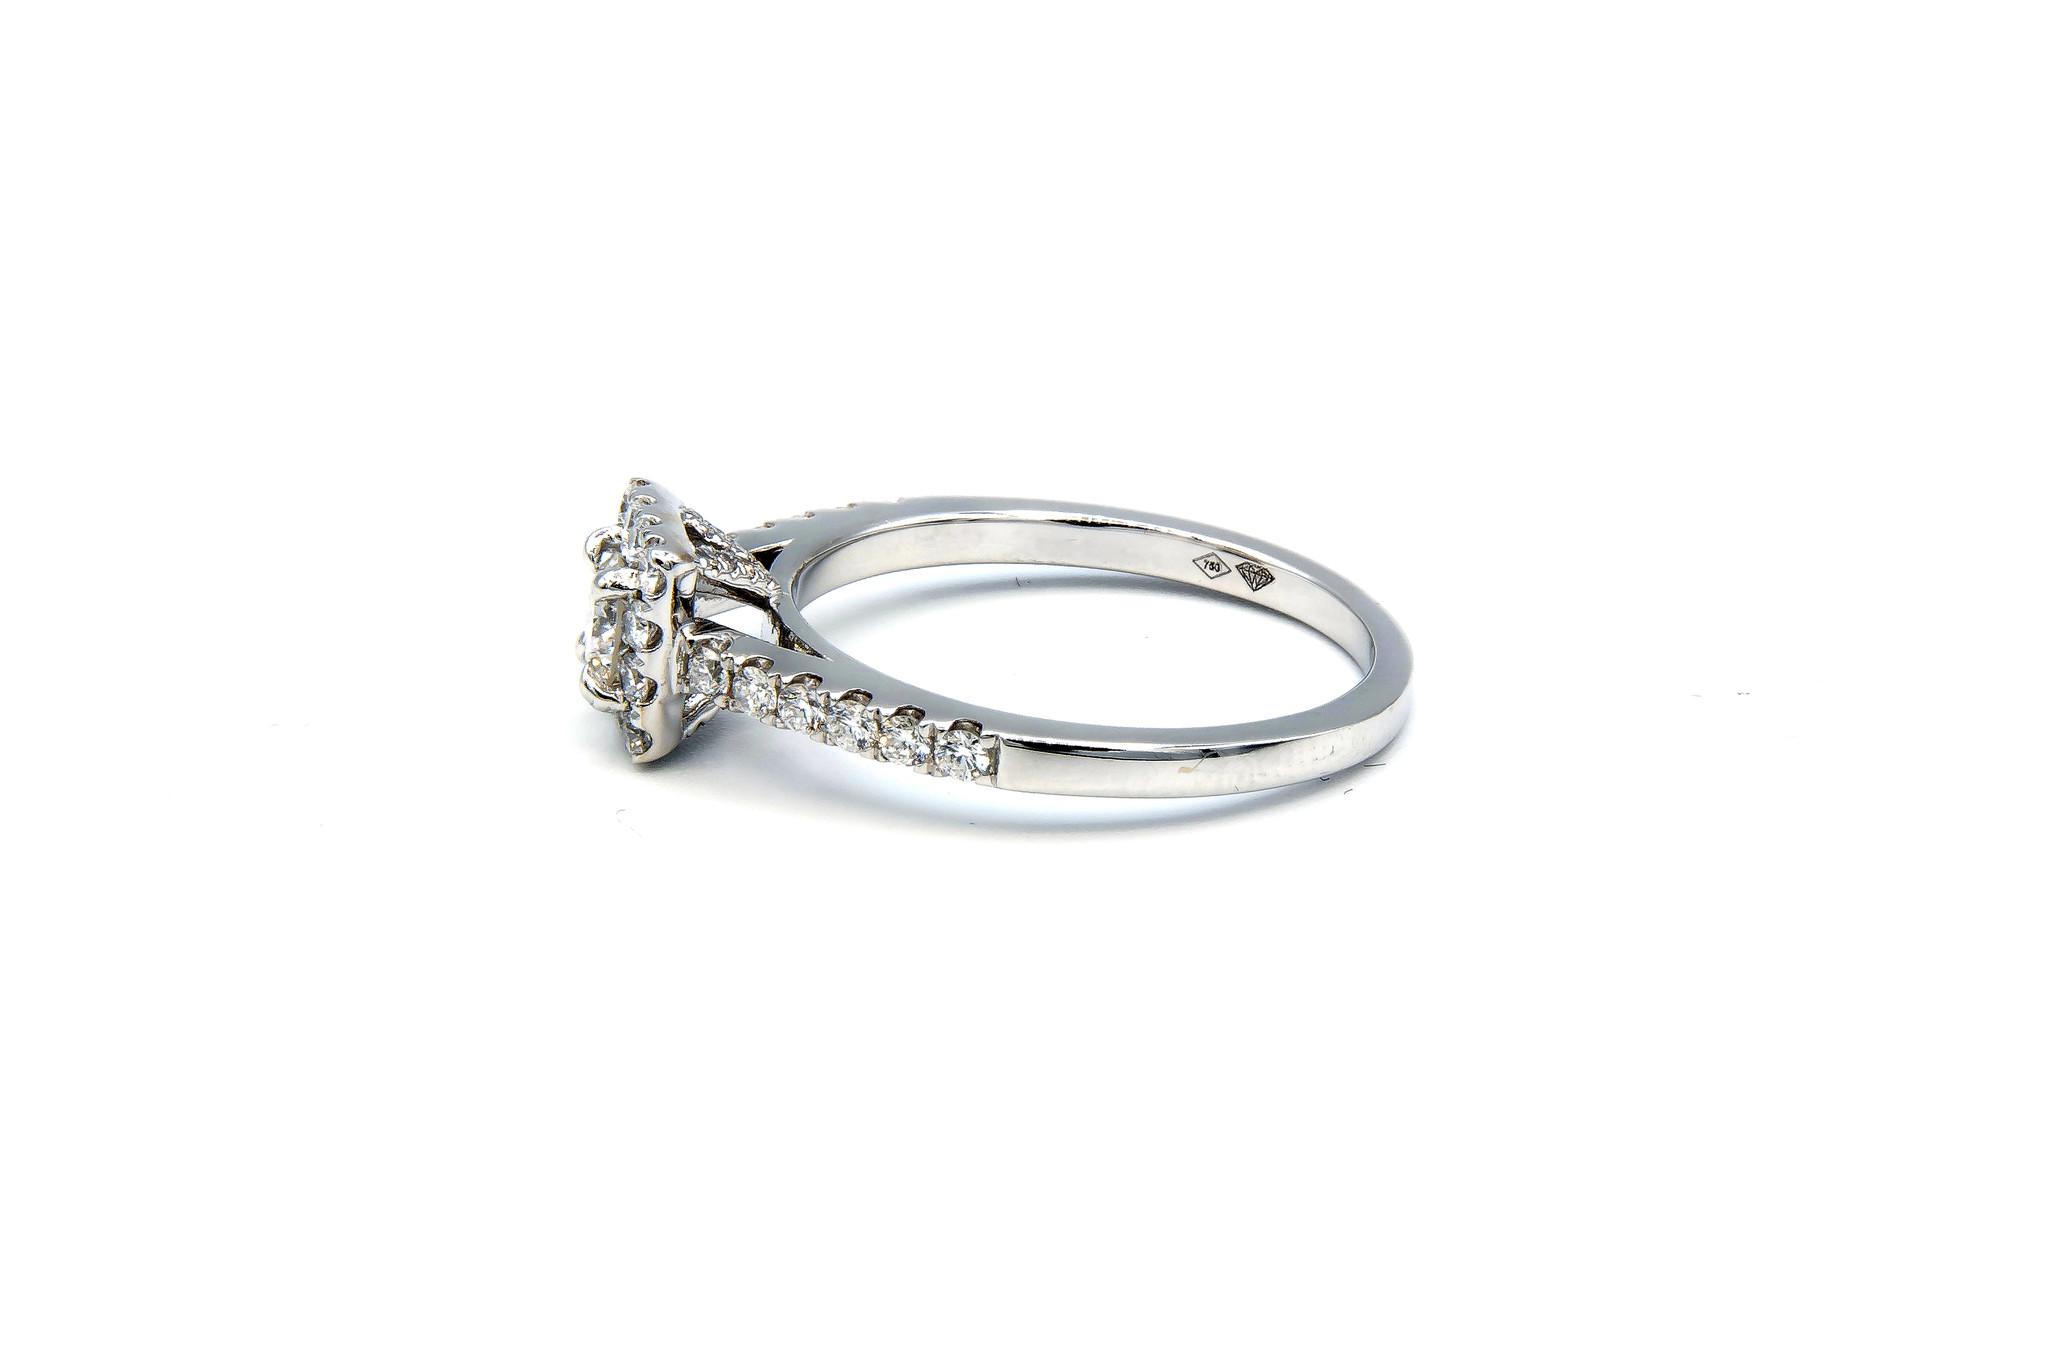 Ring verlovingsring witgoud met 0,2 ct SI en 0,28 ct VS diamant-4